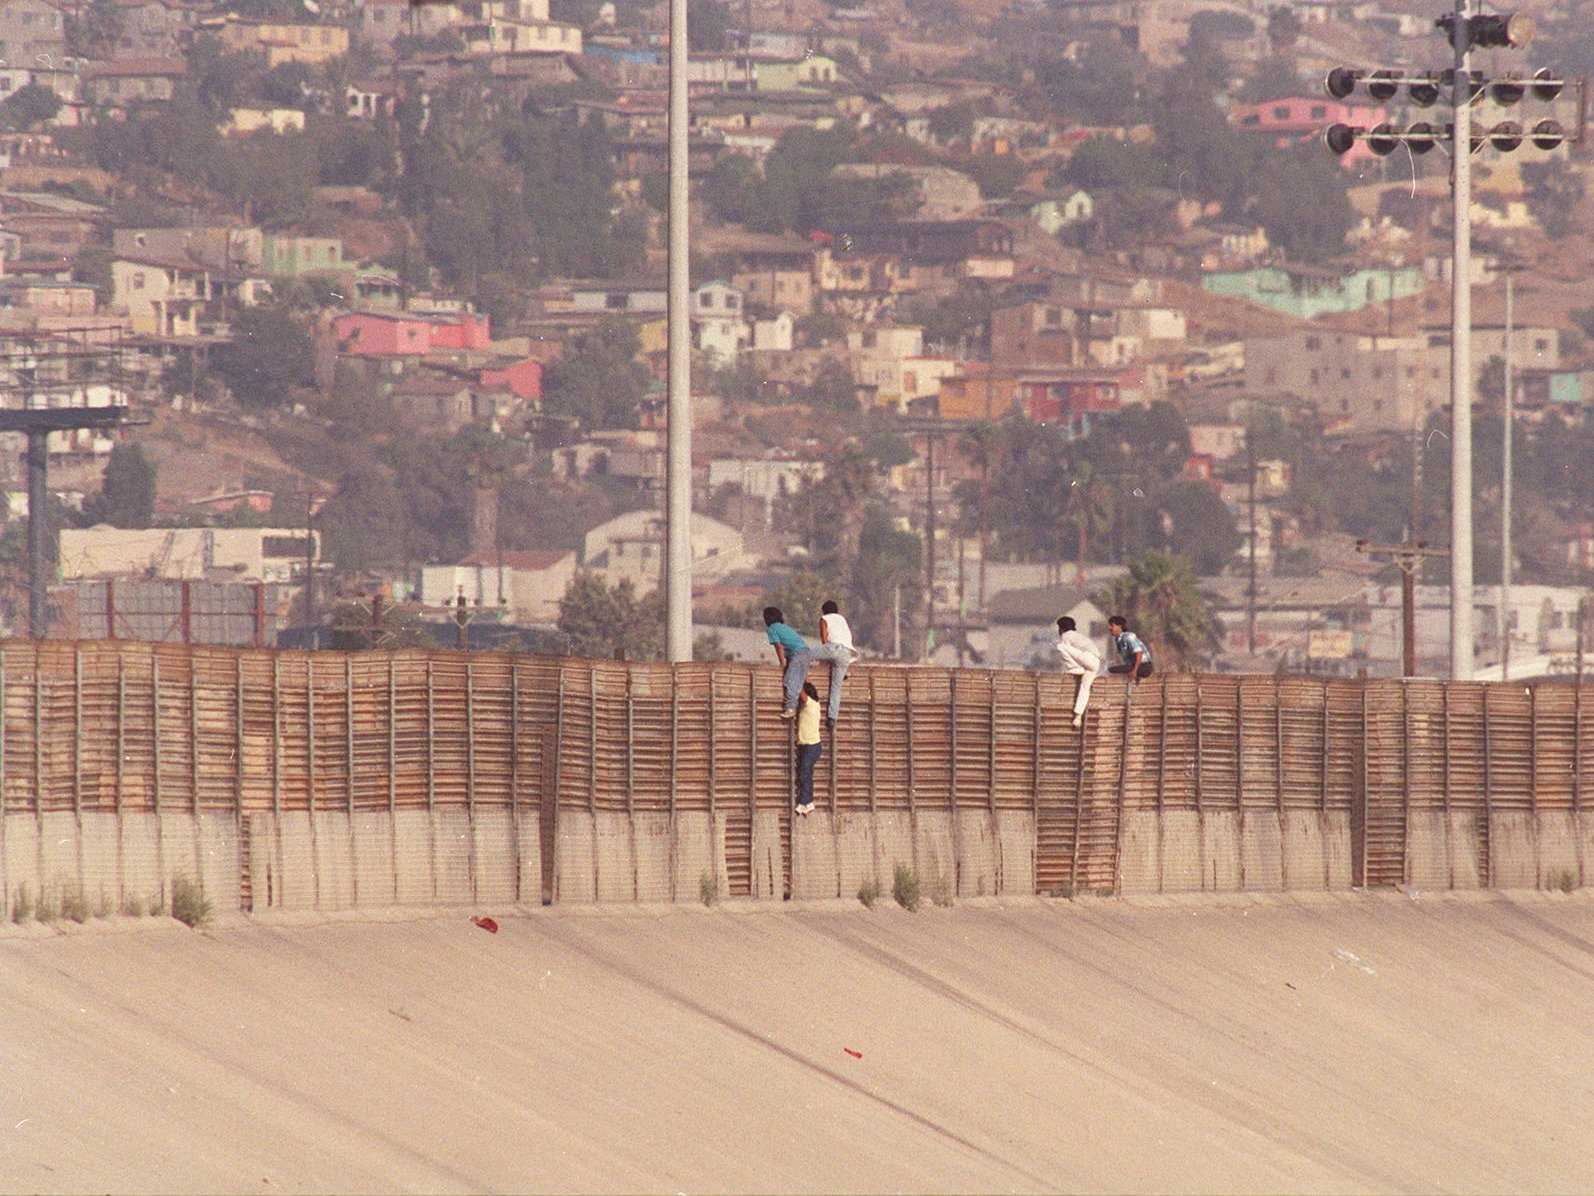 The Mexico-US Border